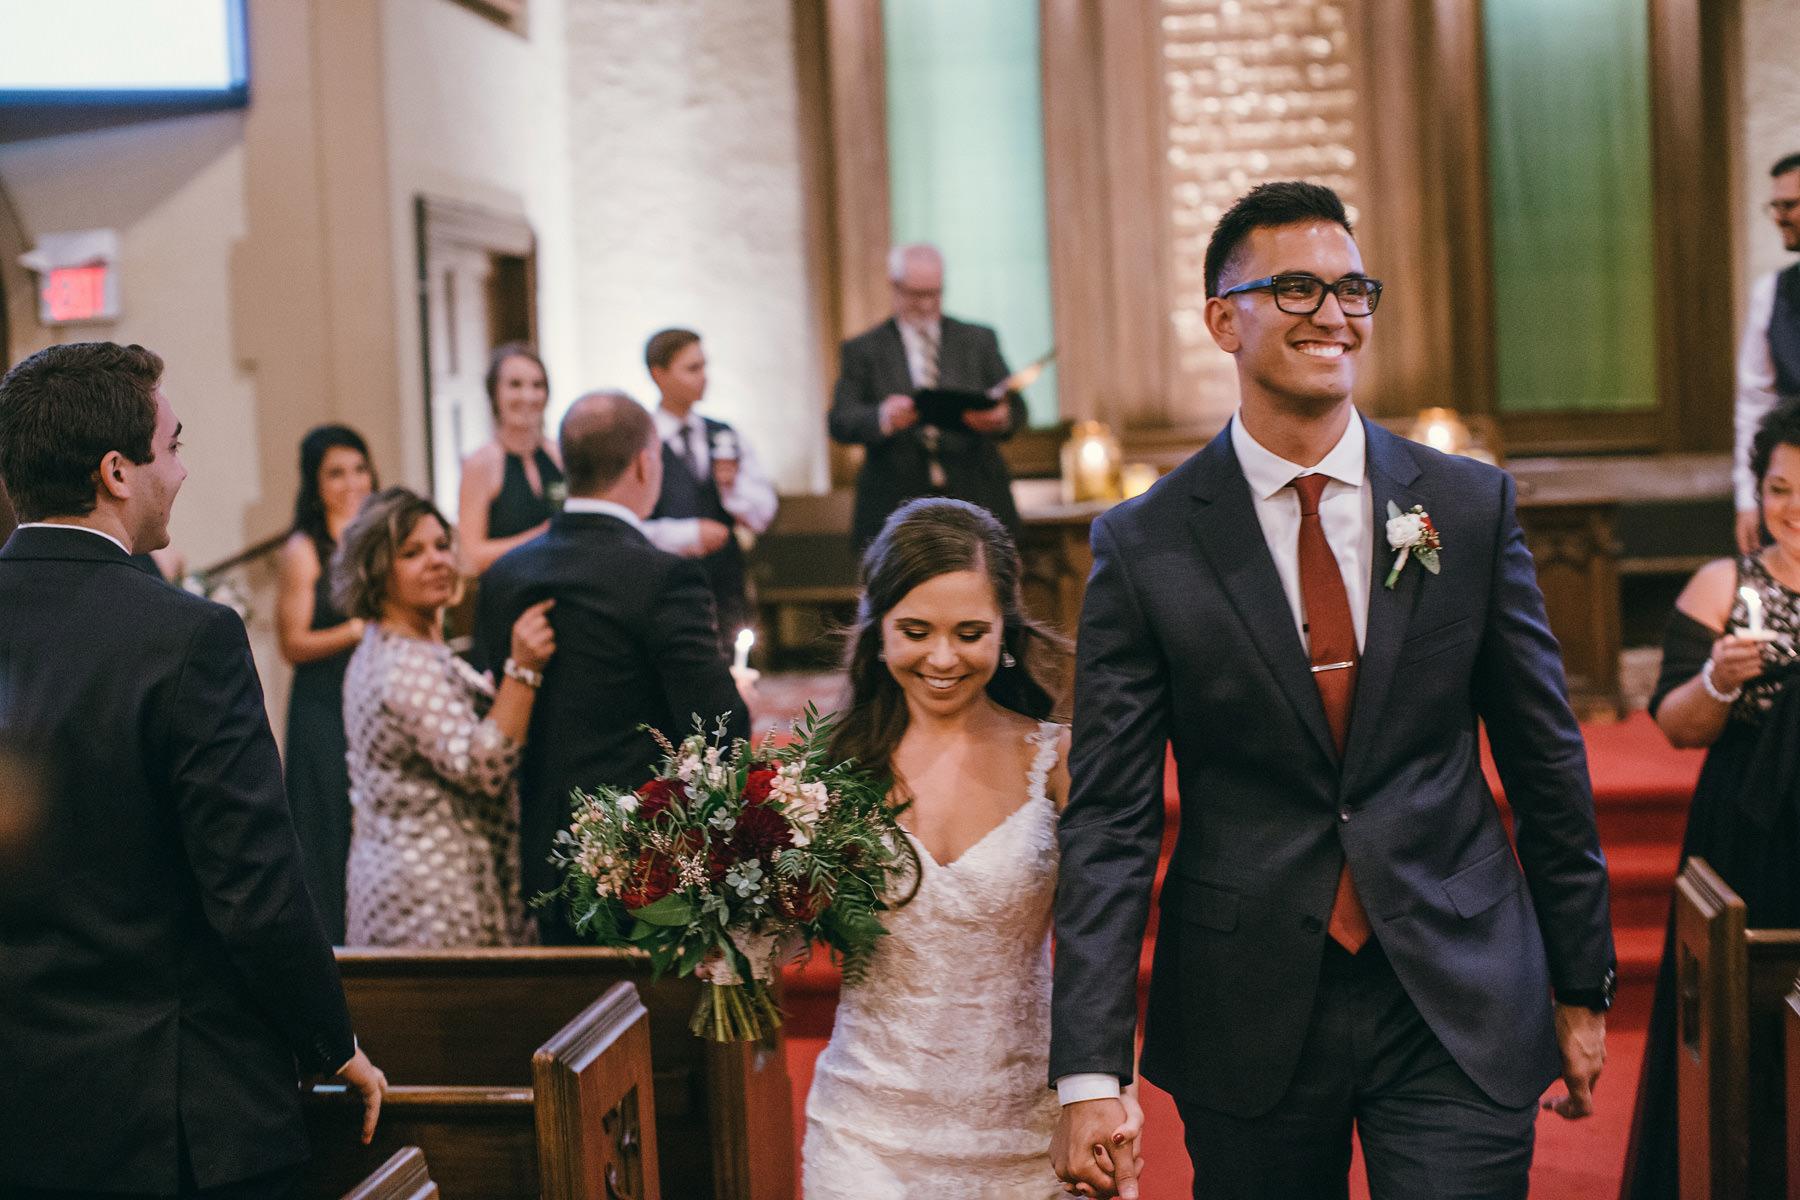 Kansas City Summer Wedding at the Guild_Kindling Wedding Photography Blog59.JPG